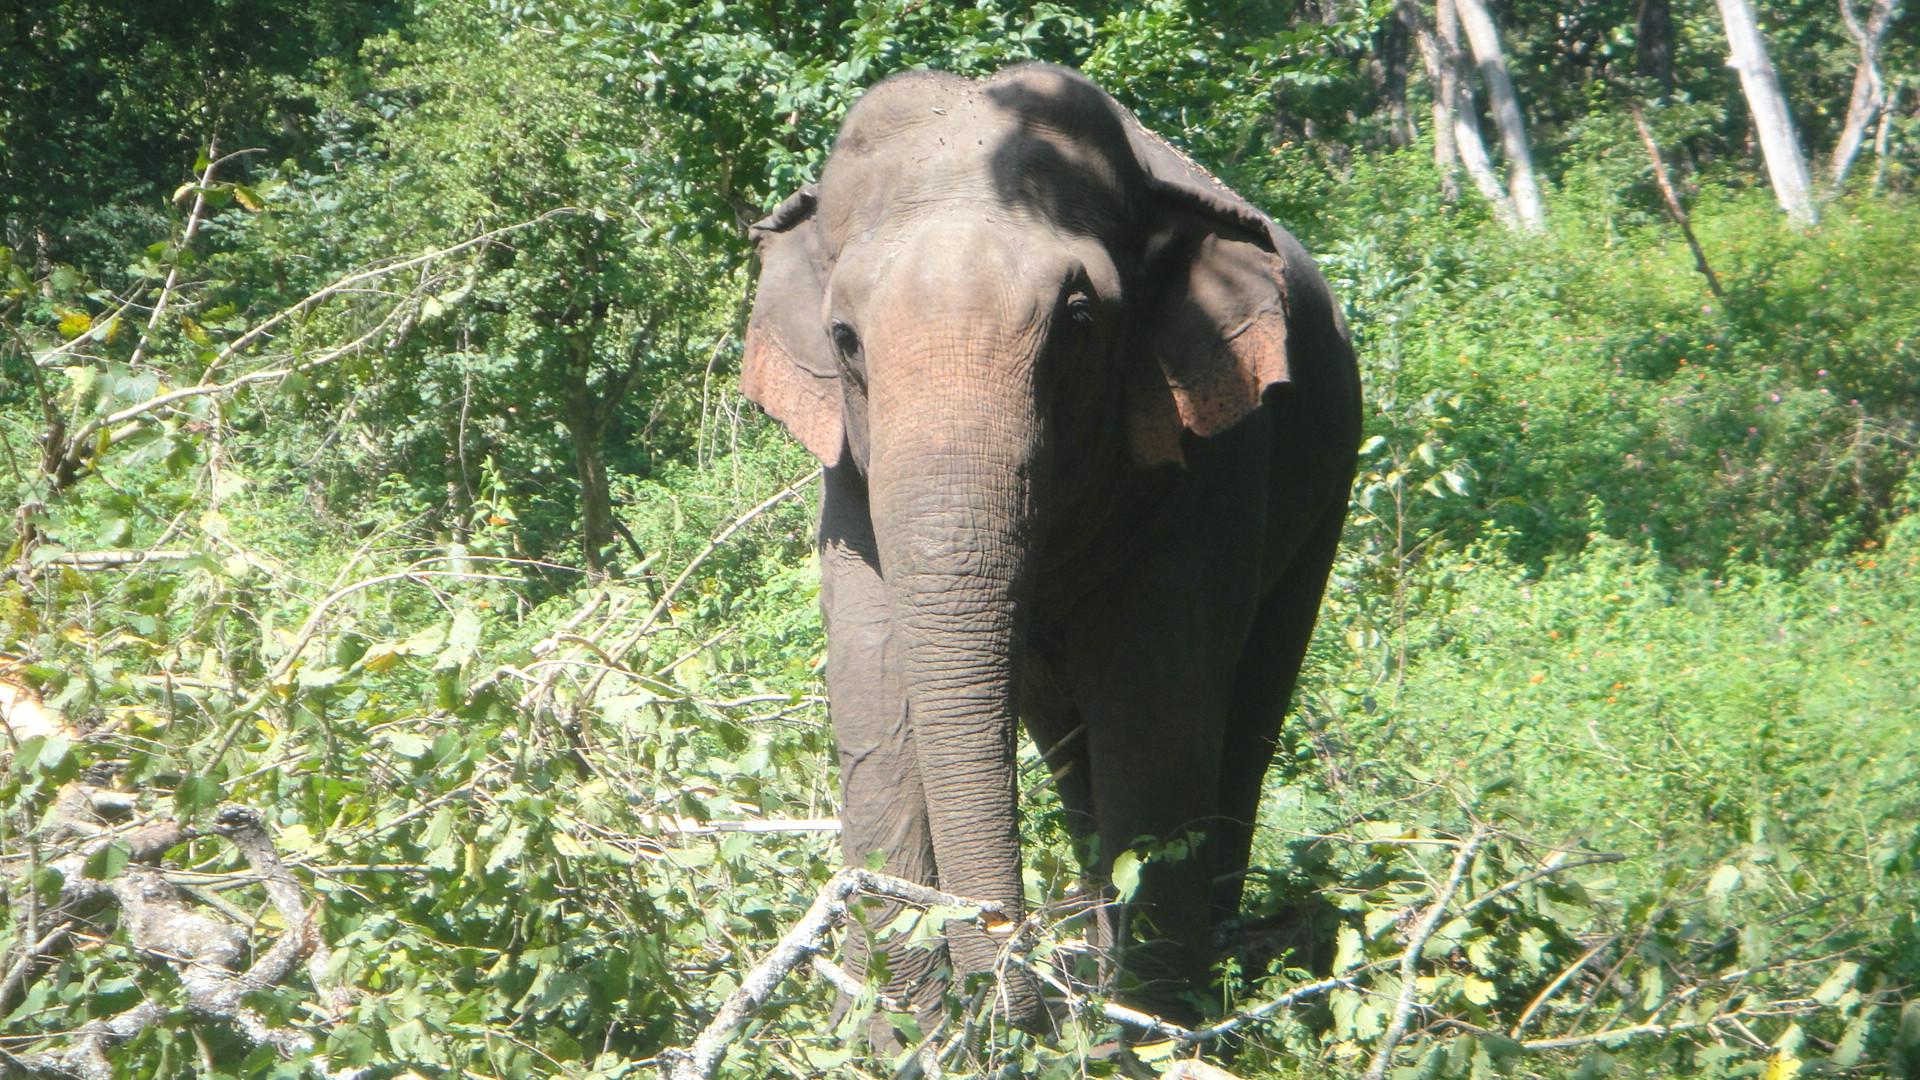 Single elephant walking in a jungle photo